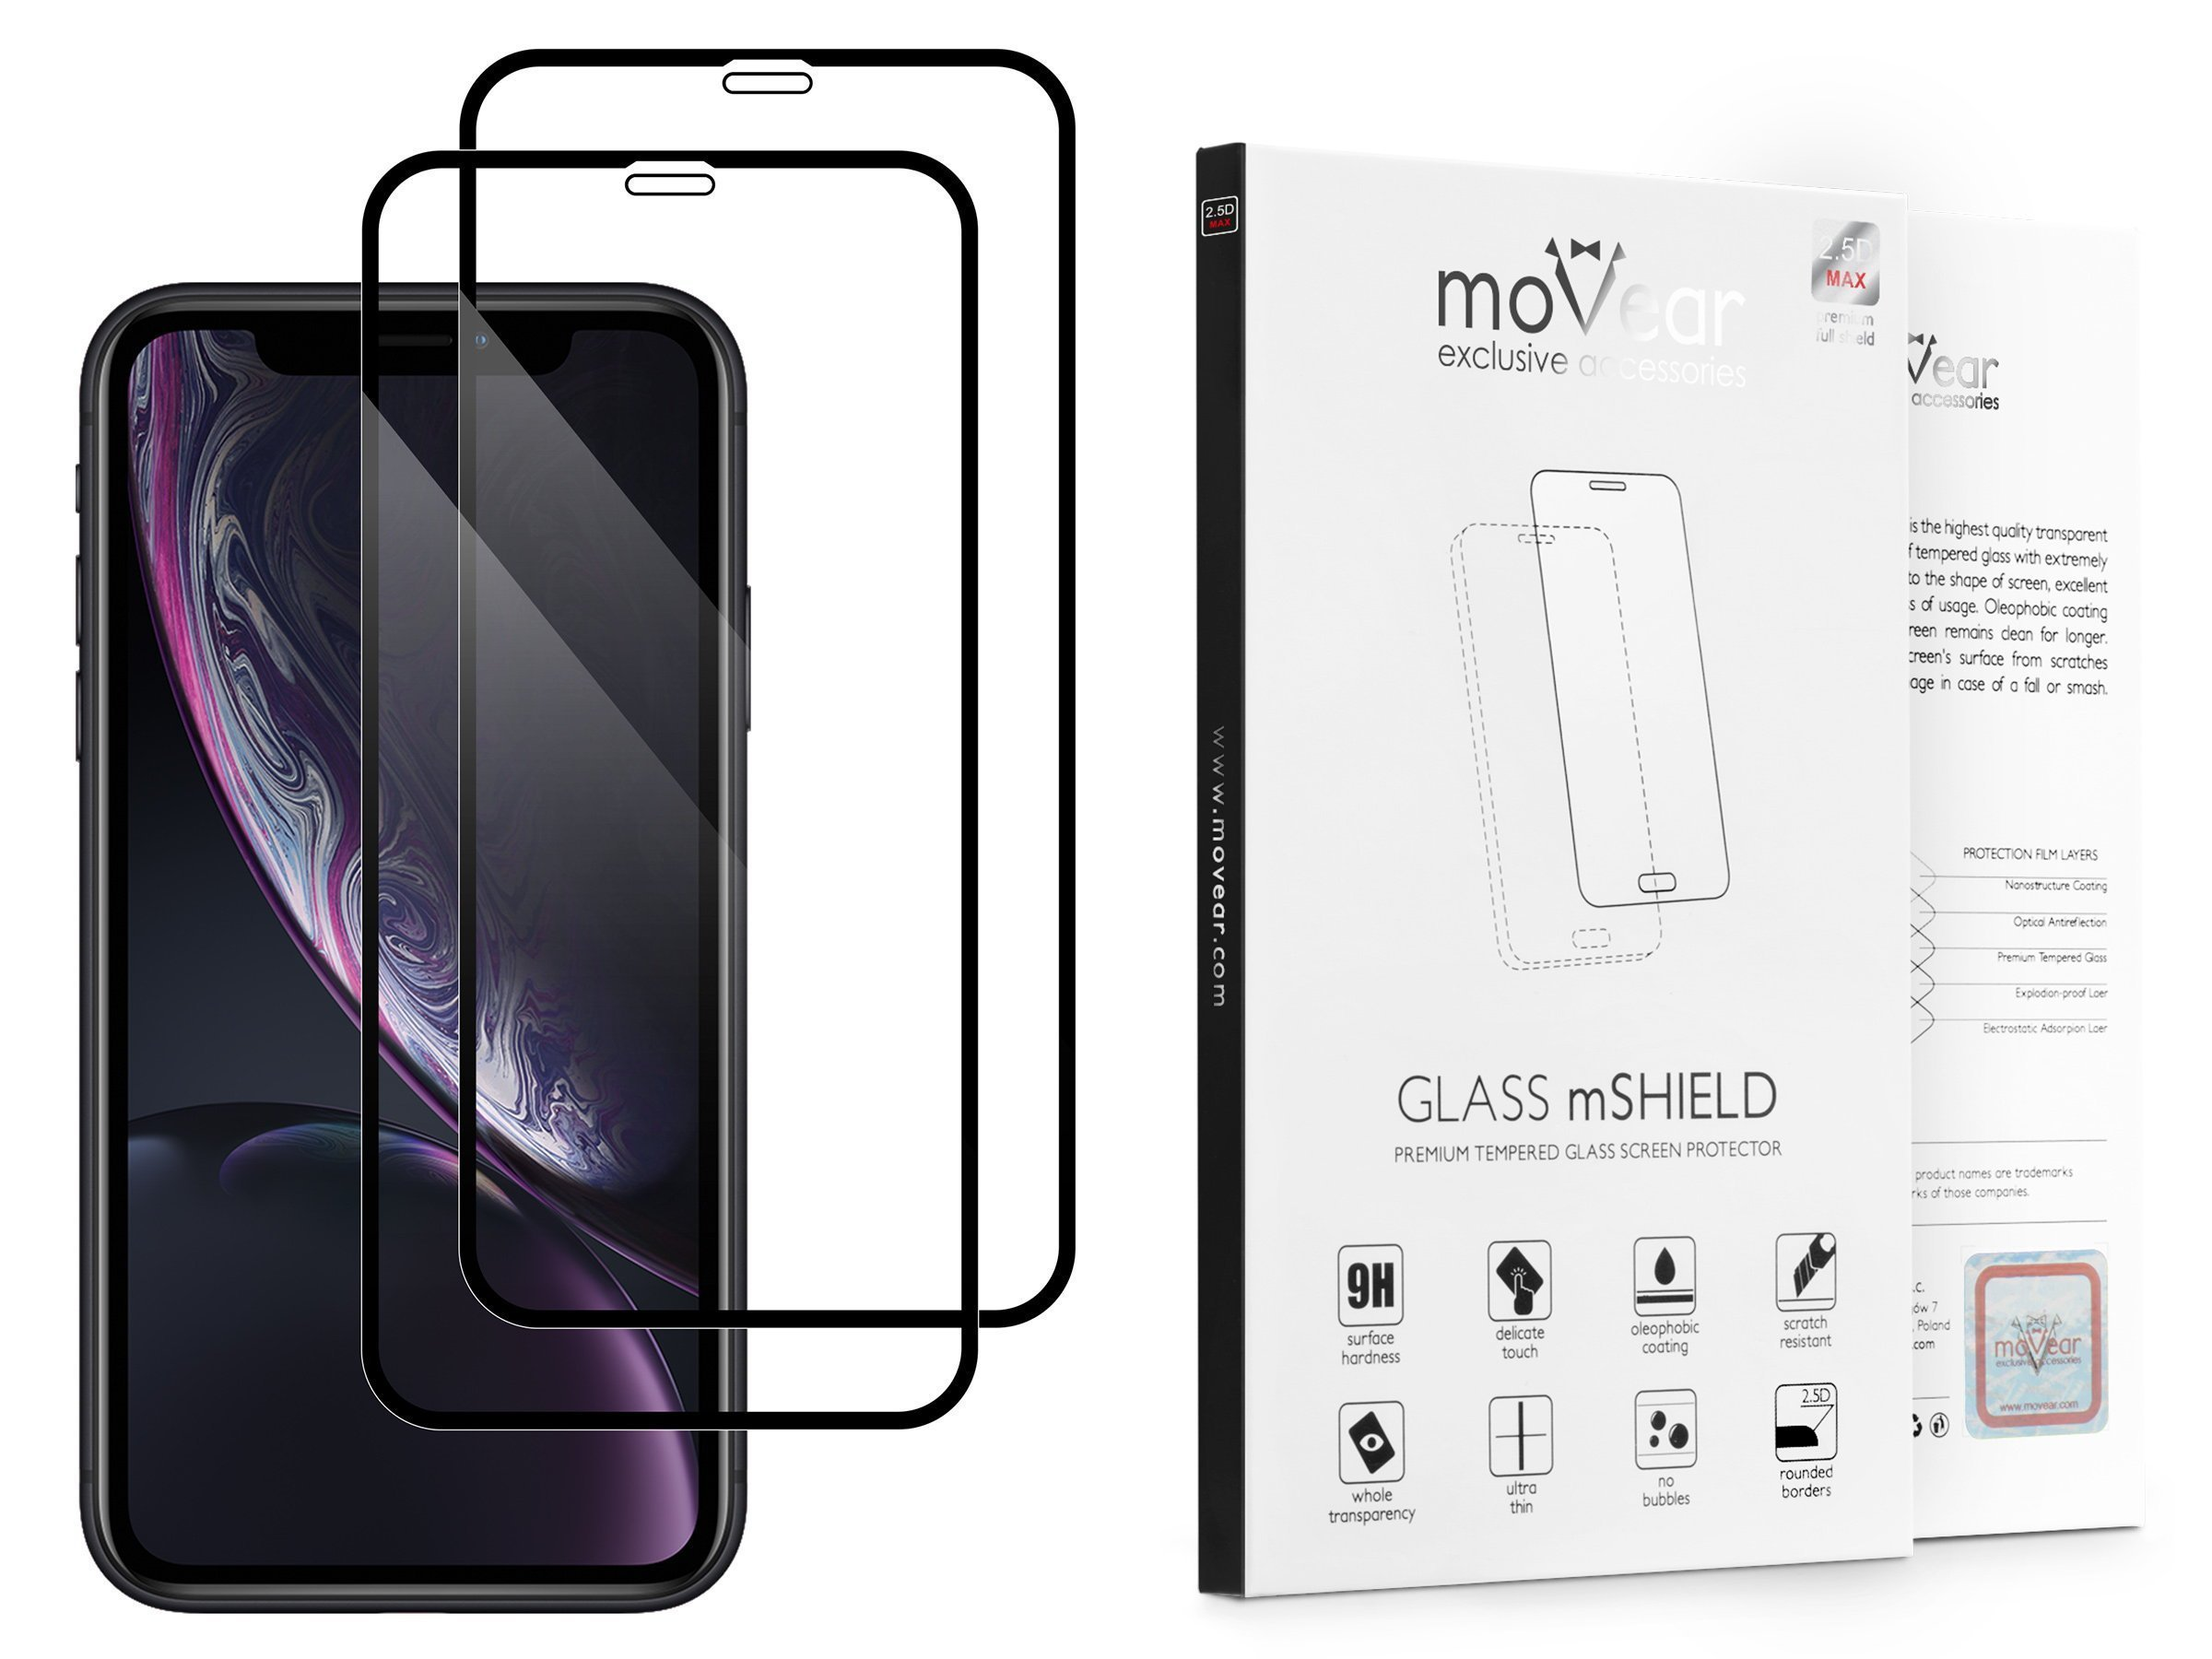 2 szt.   moVear Szkło Hartowane 2.5D MAX na Apple iPhone Xr   do etui, 9H   GLASS mSHIELD Czarny